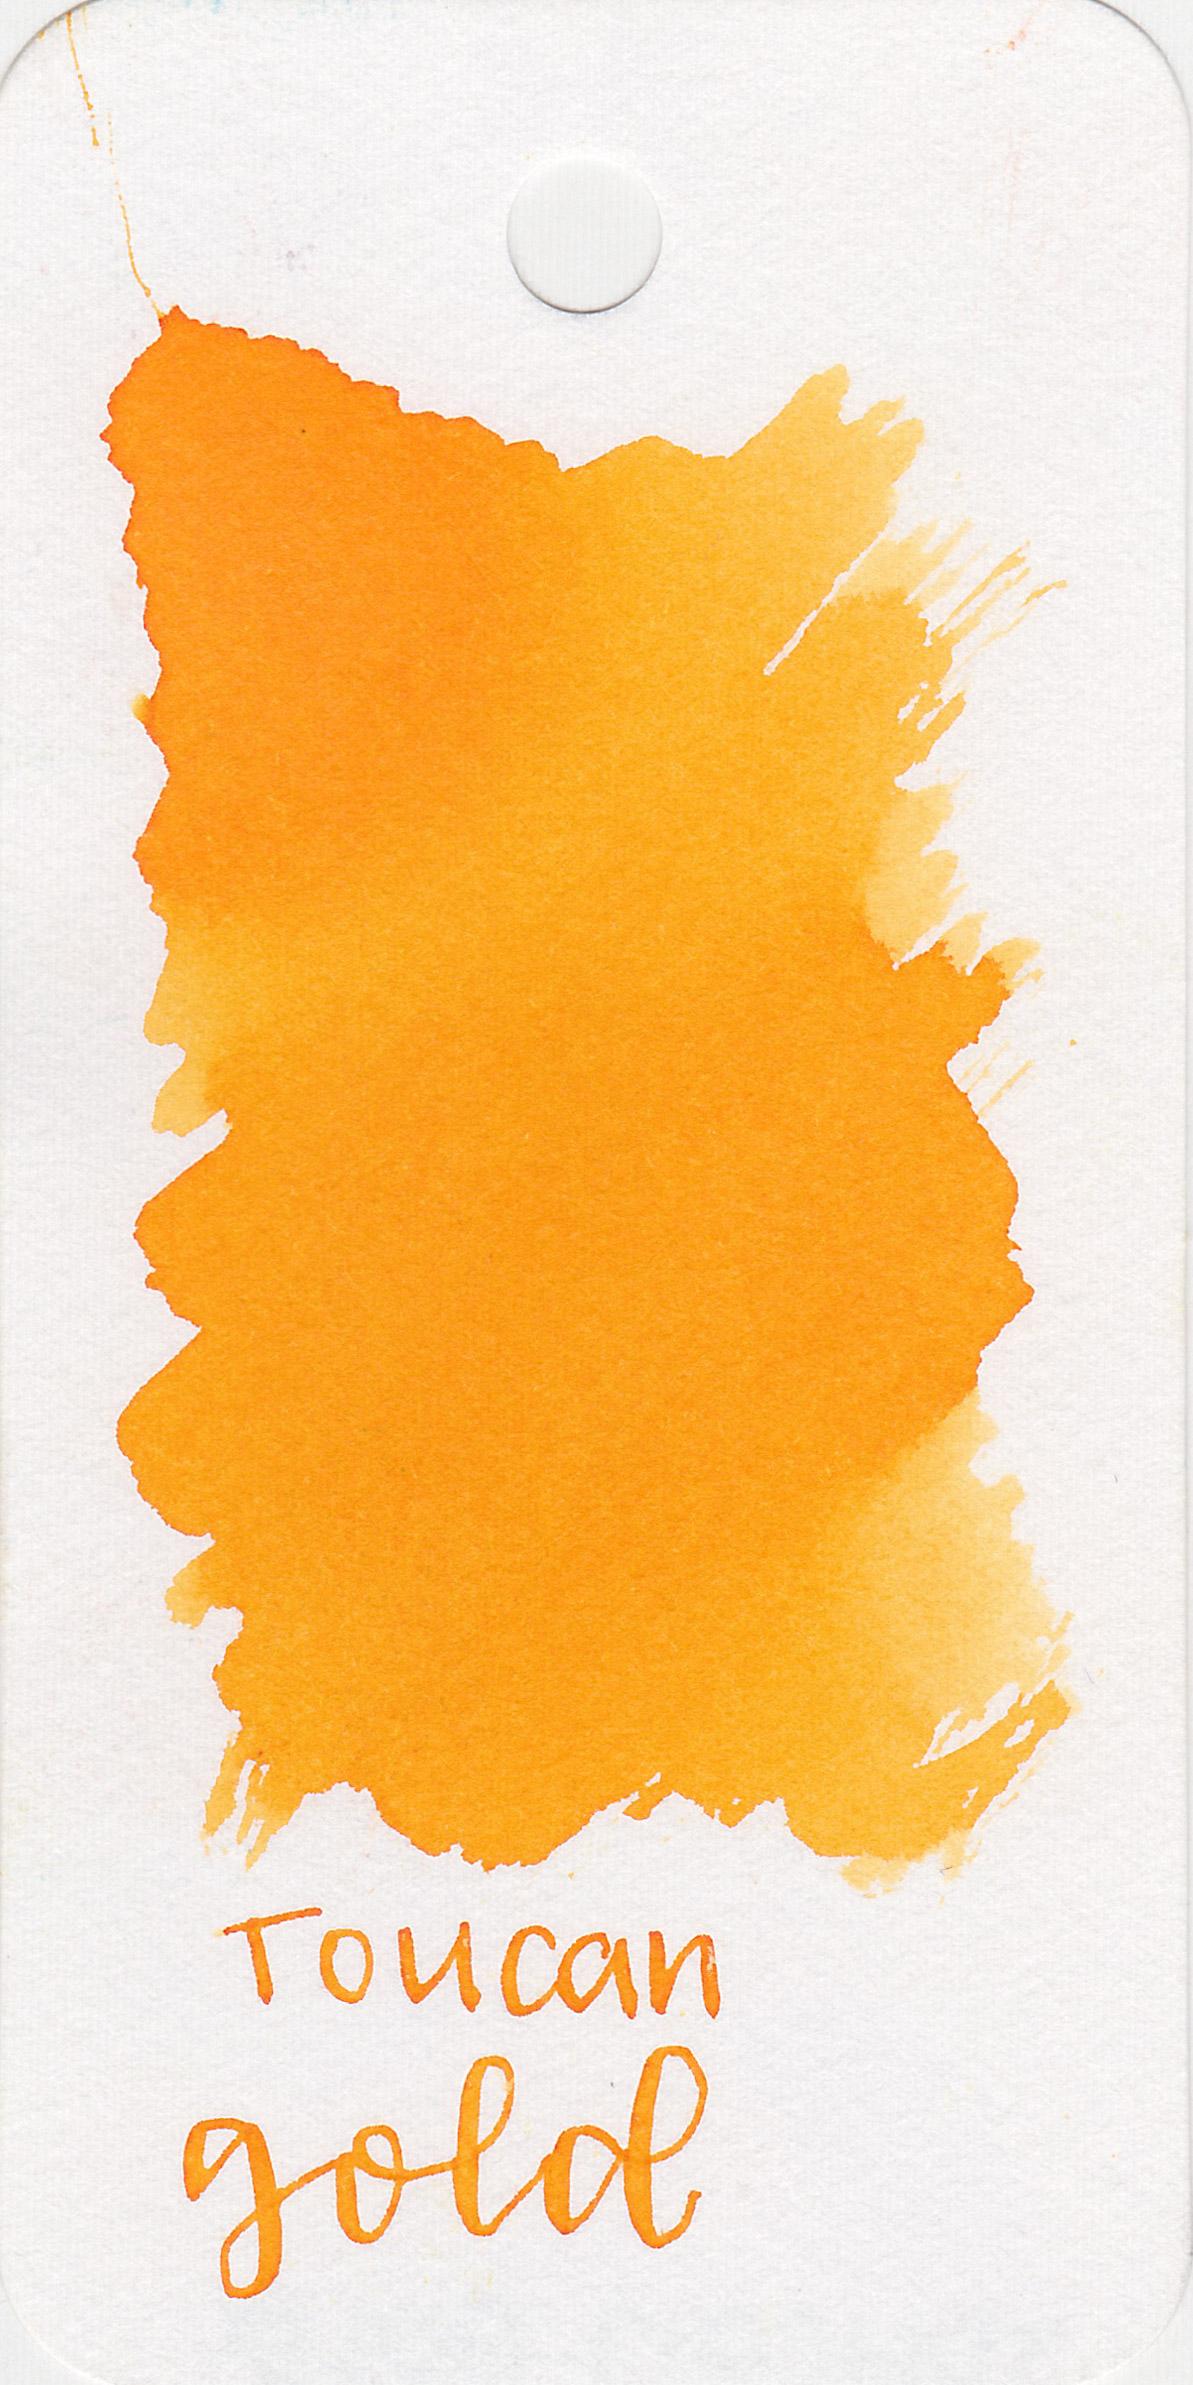 tc-gold-1.jpg